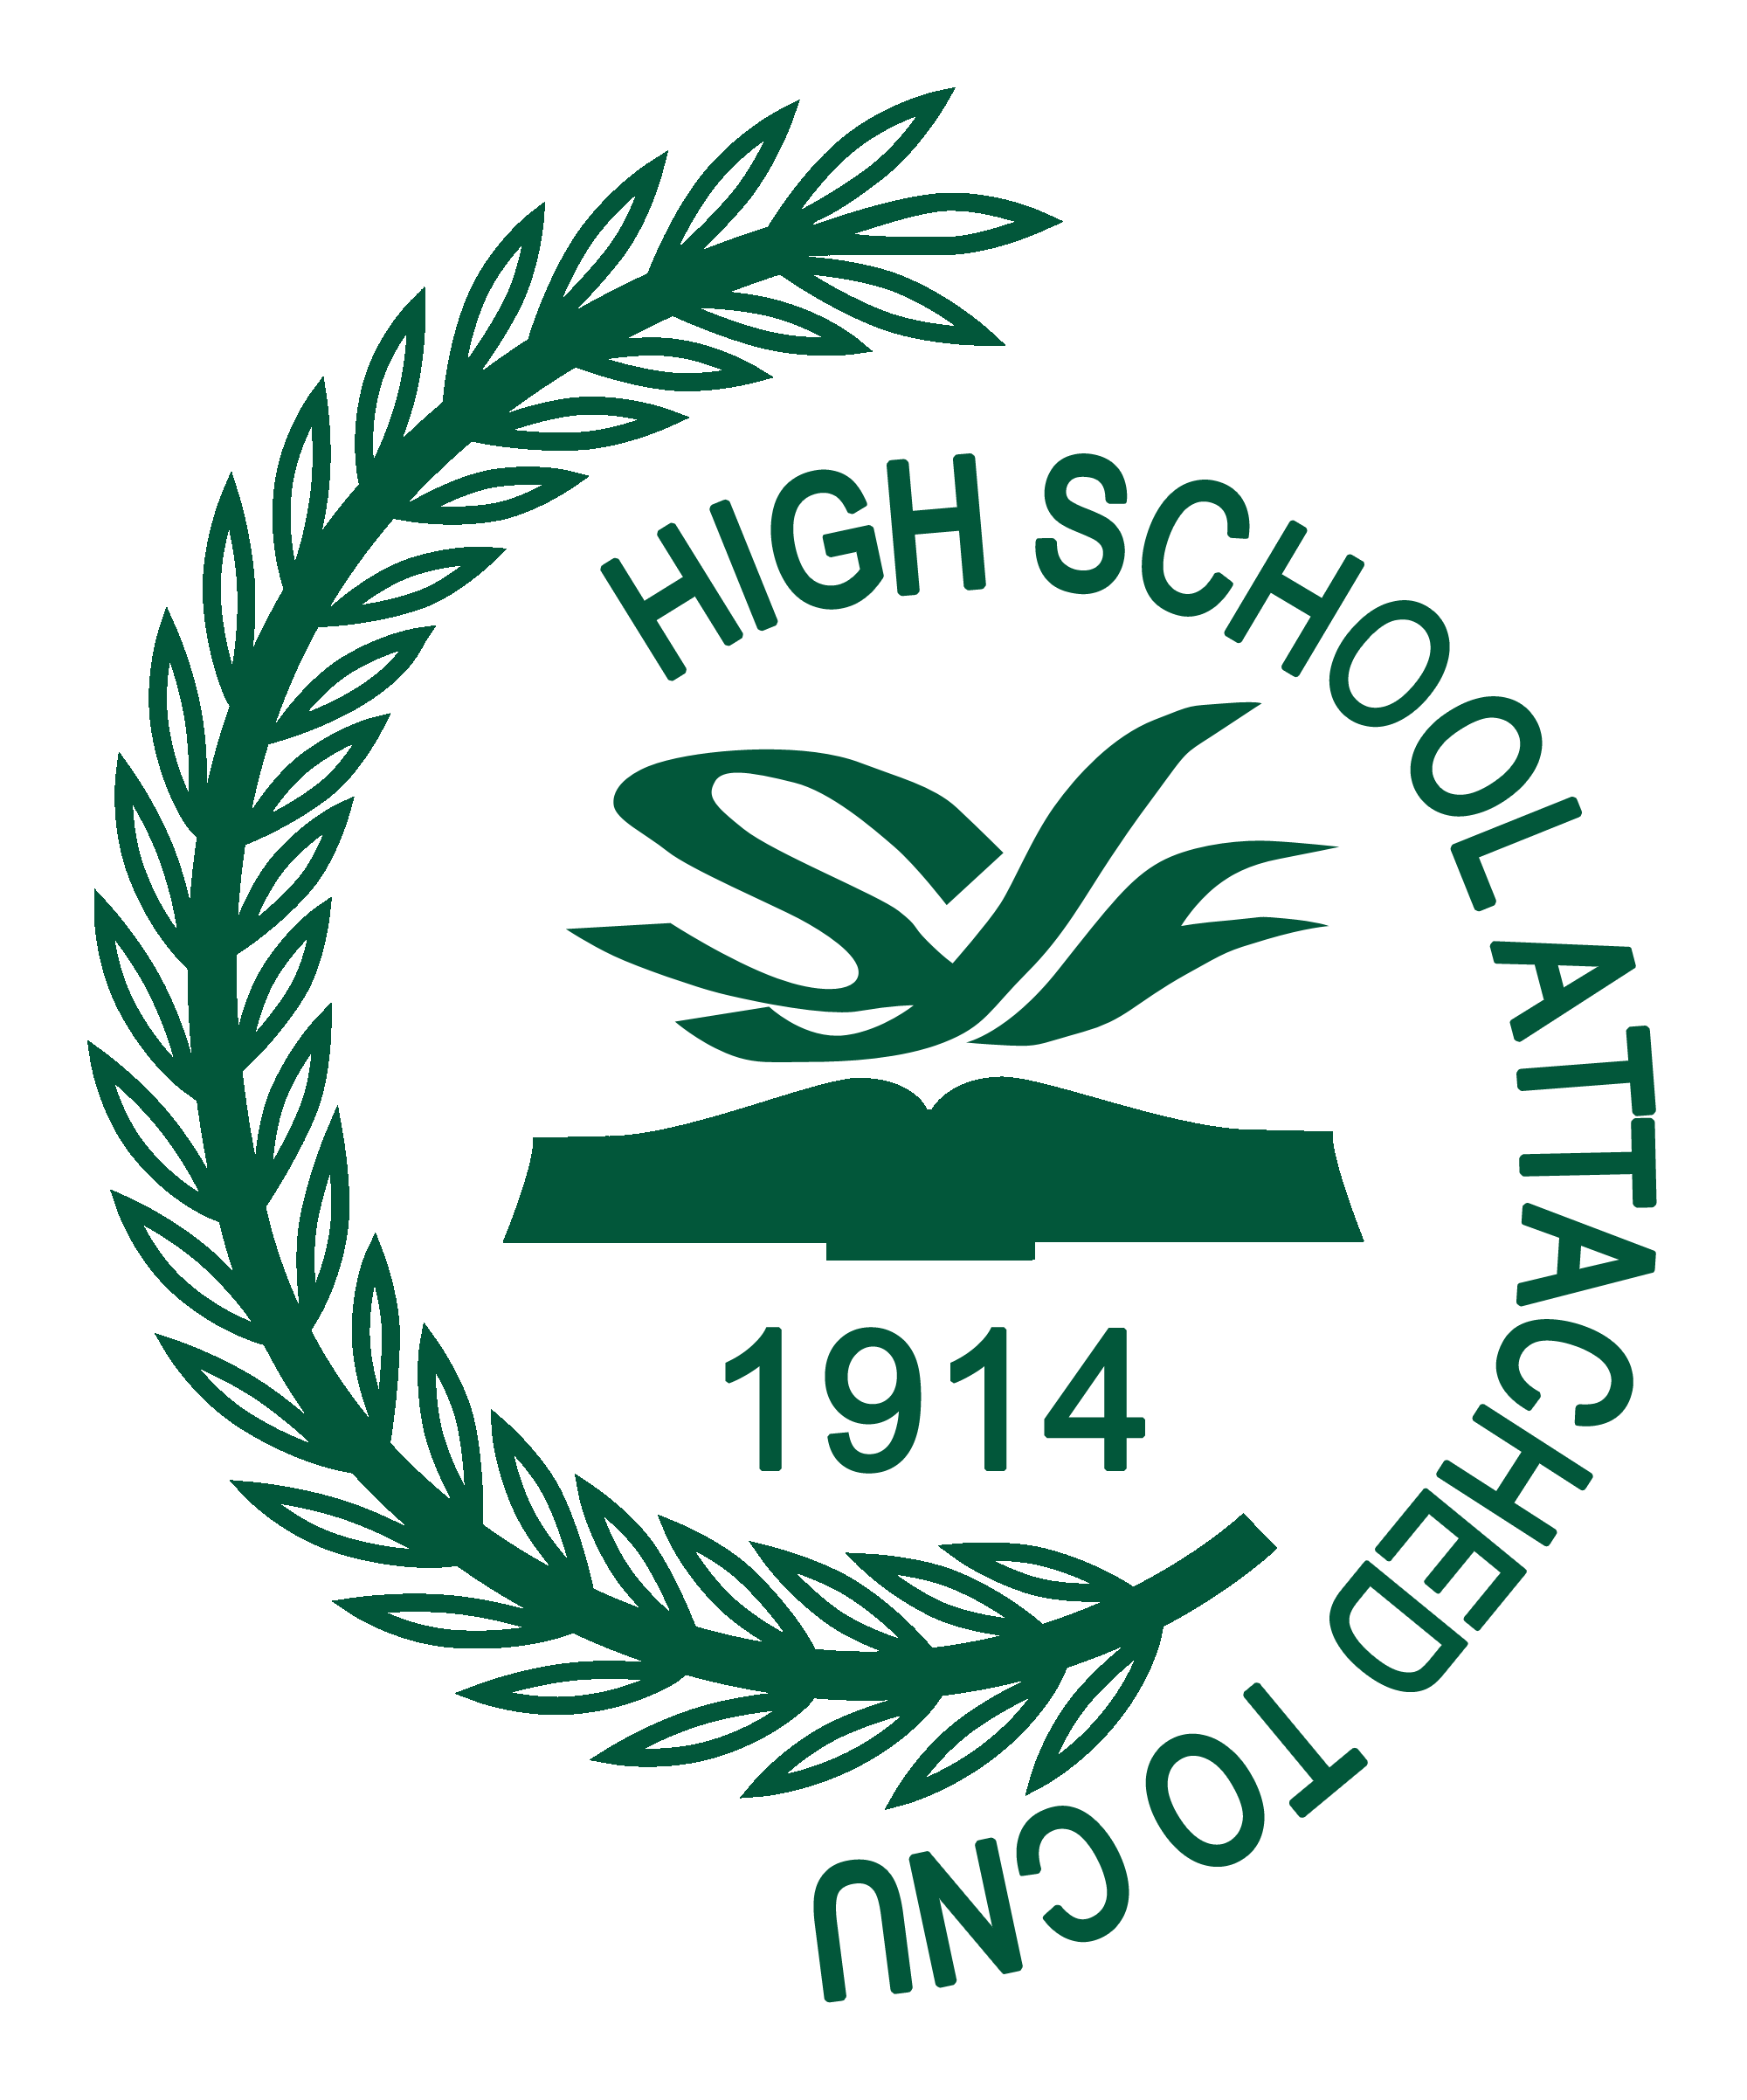 School Logo Png.